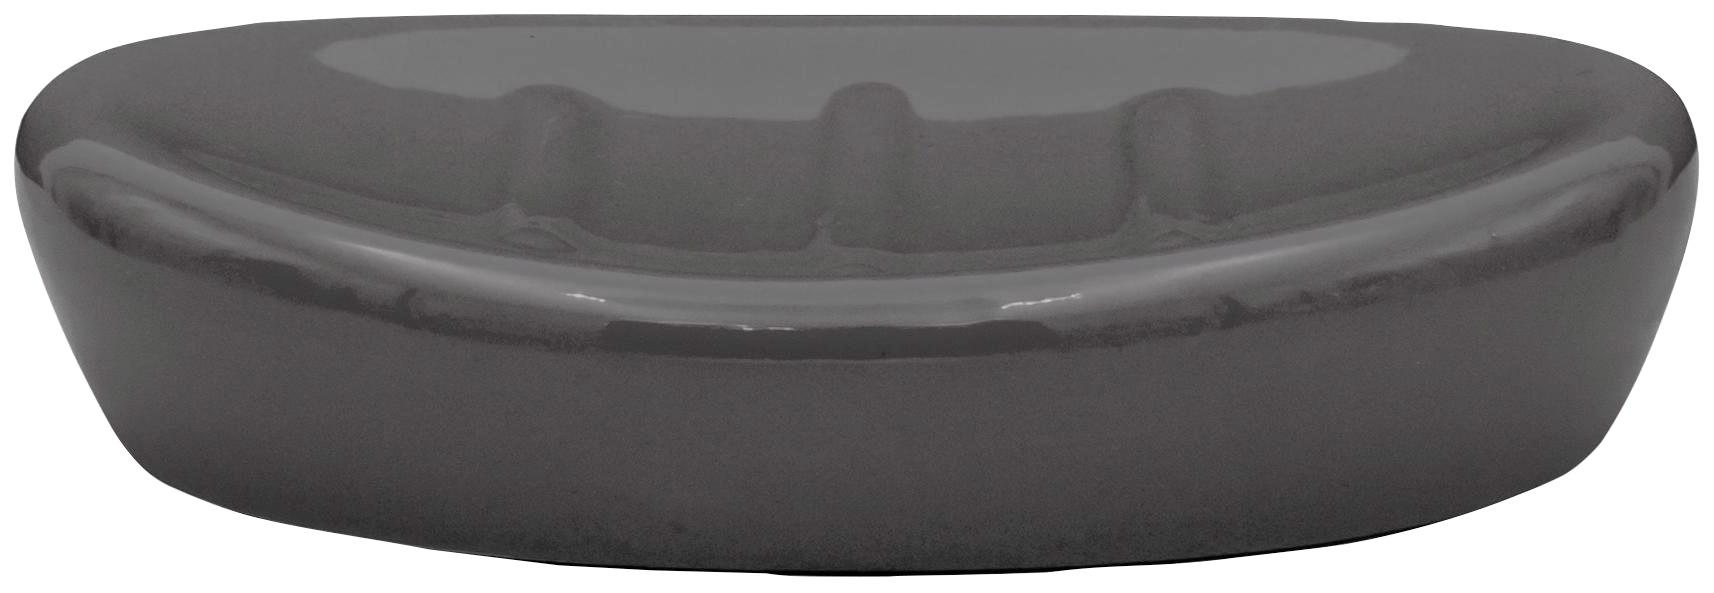 Ridder Seifenschale Belly, Keramik grau Bad Sanitär